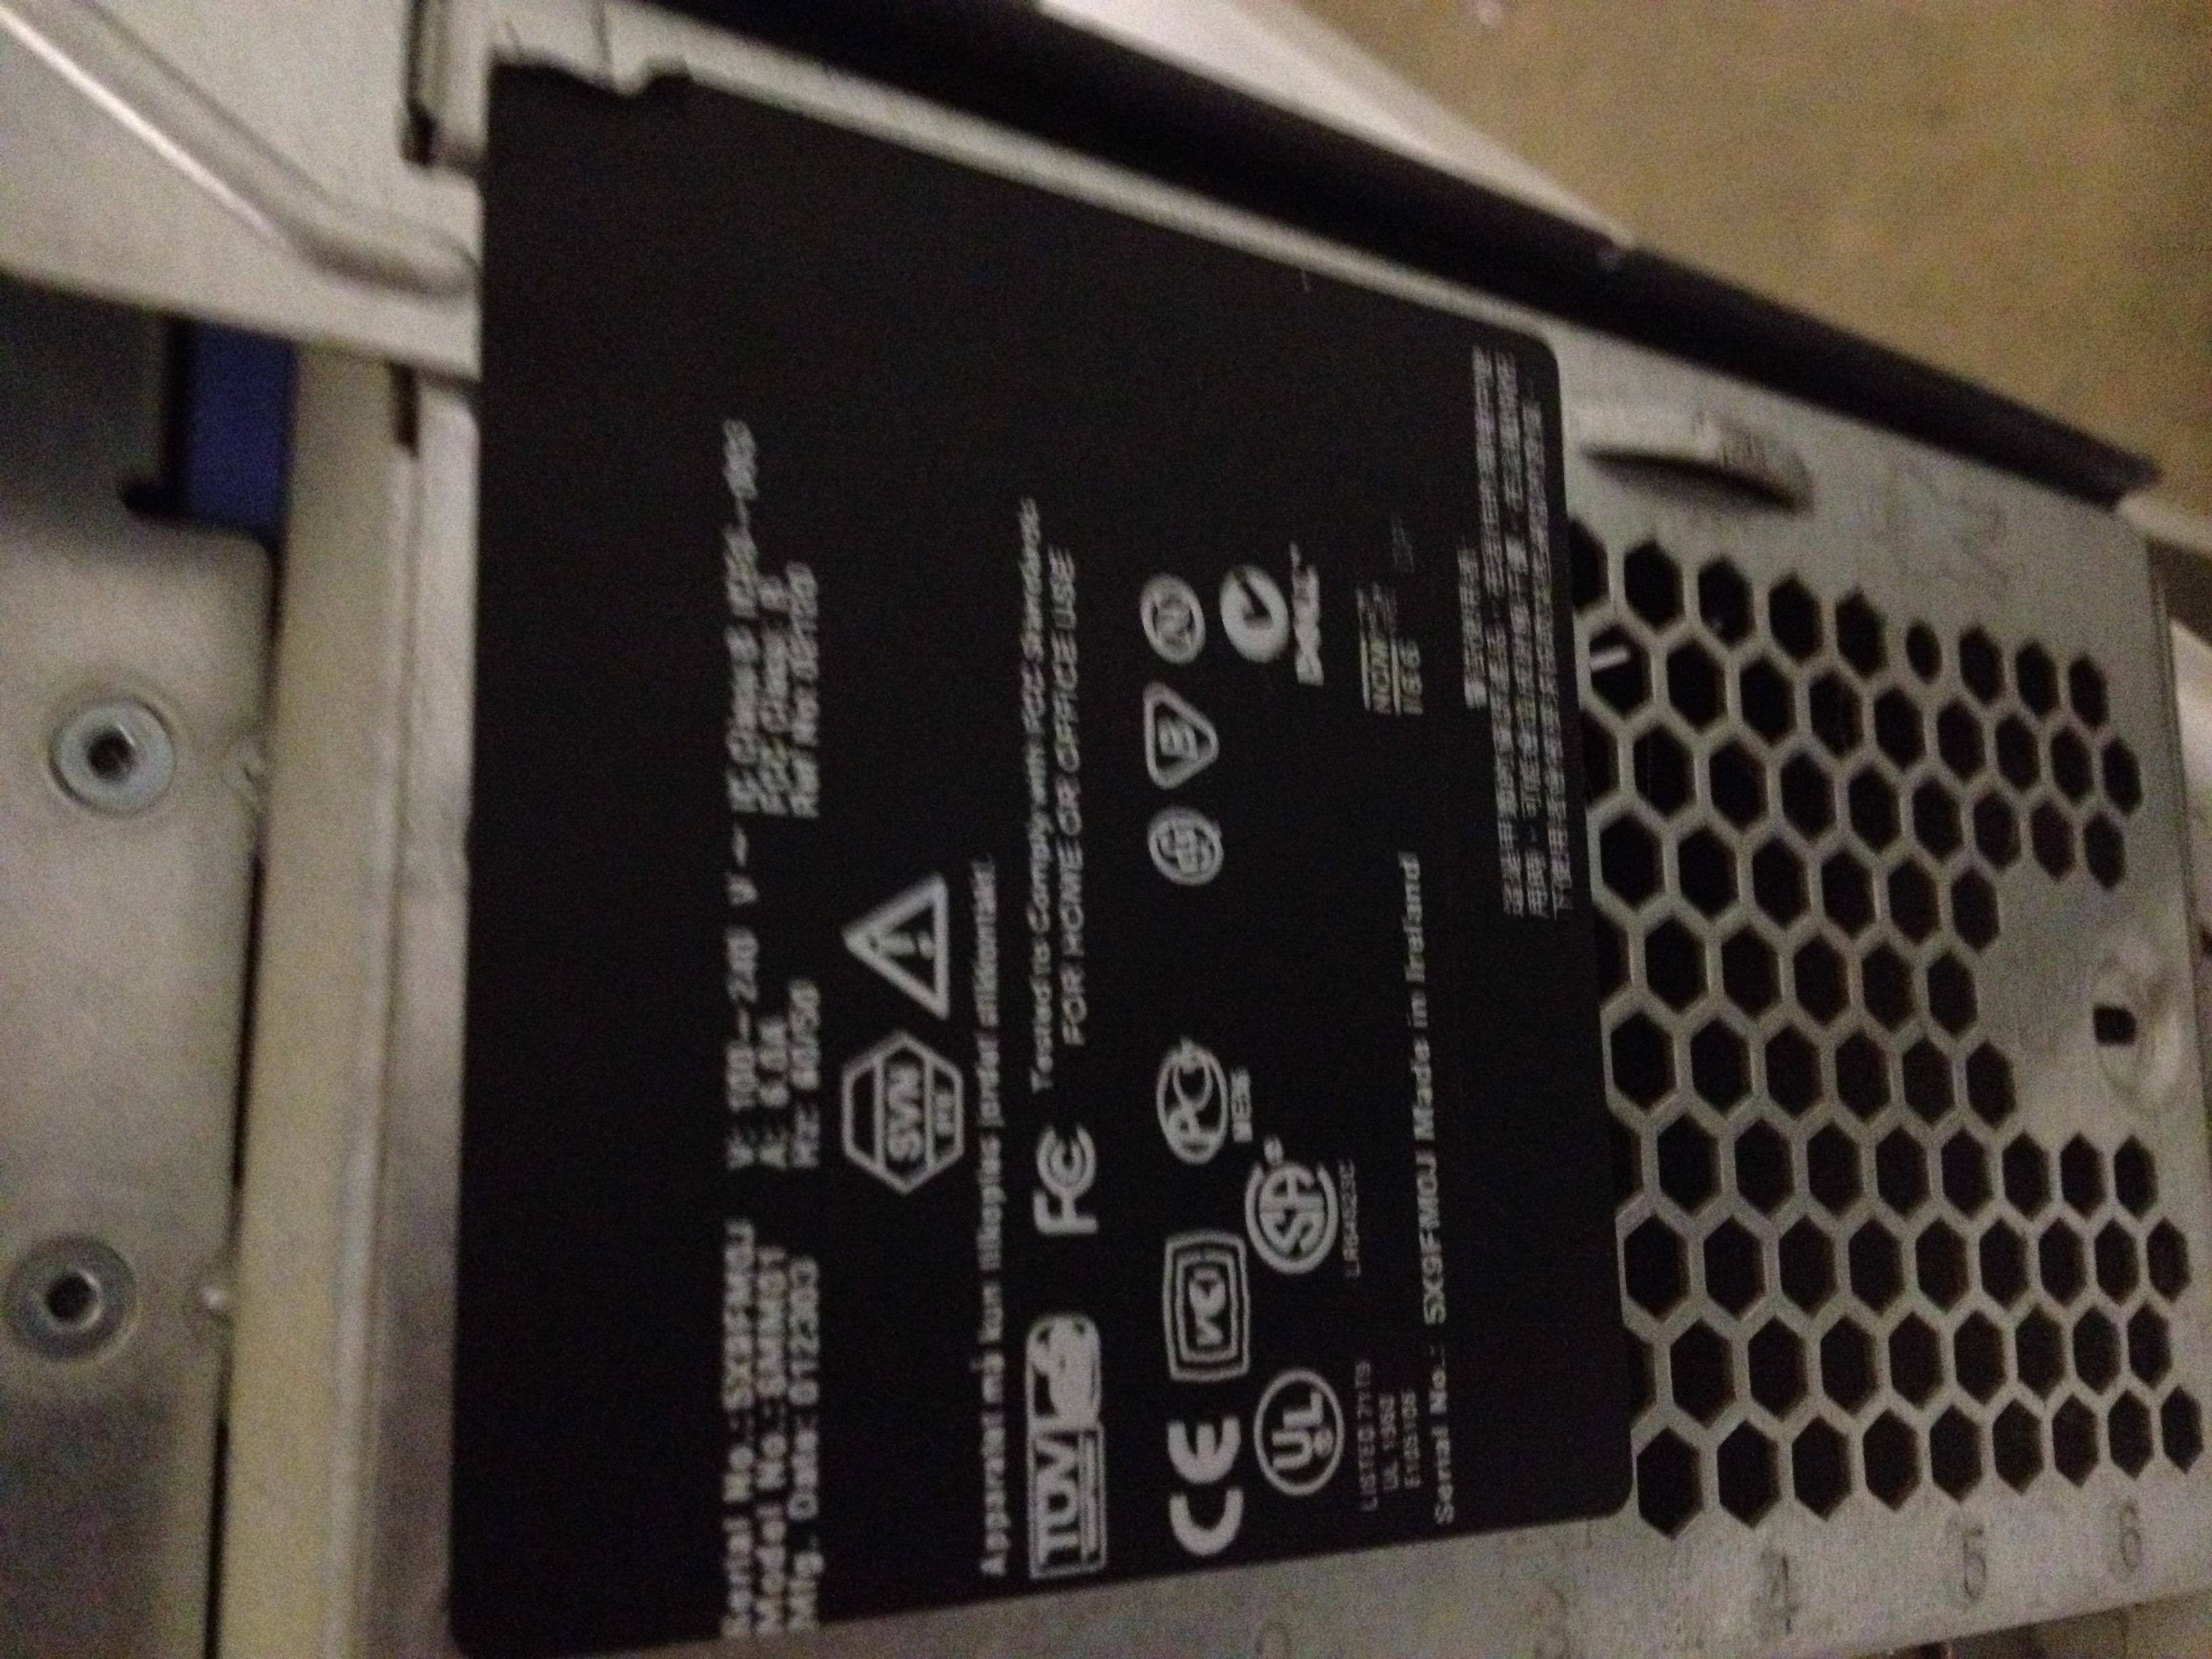 Dell Poweredge Server 1600SC - Image 4 of 5